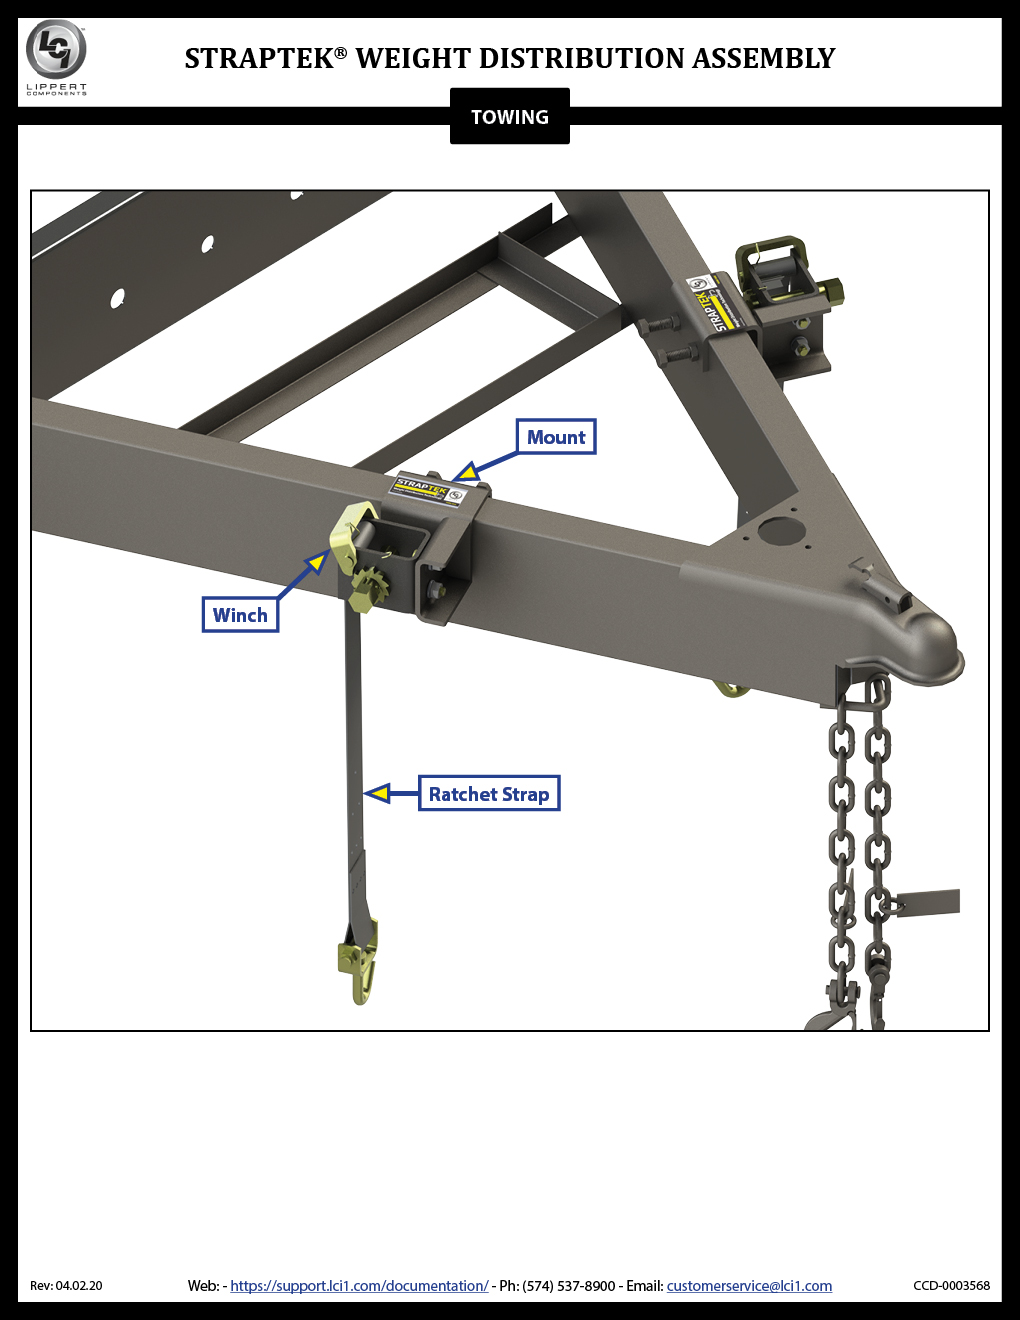 Straptek® Assembly